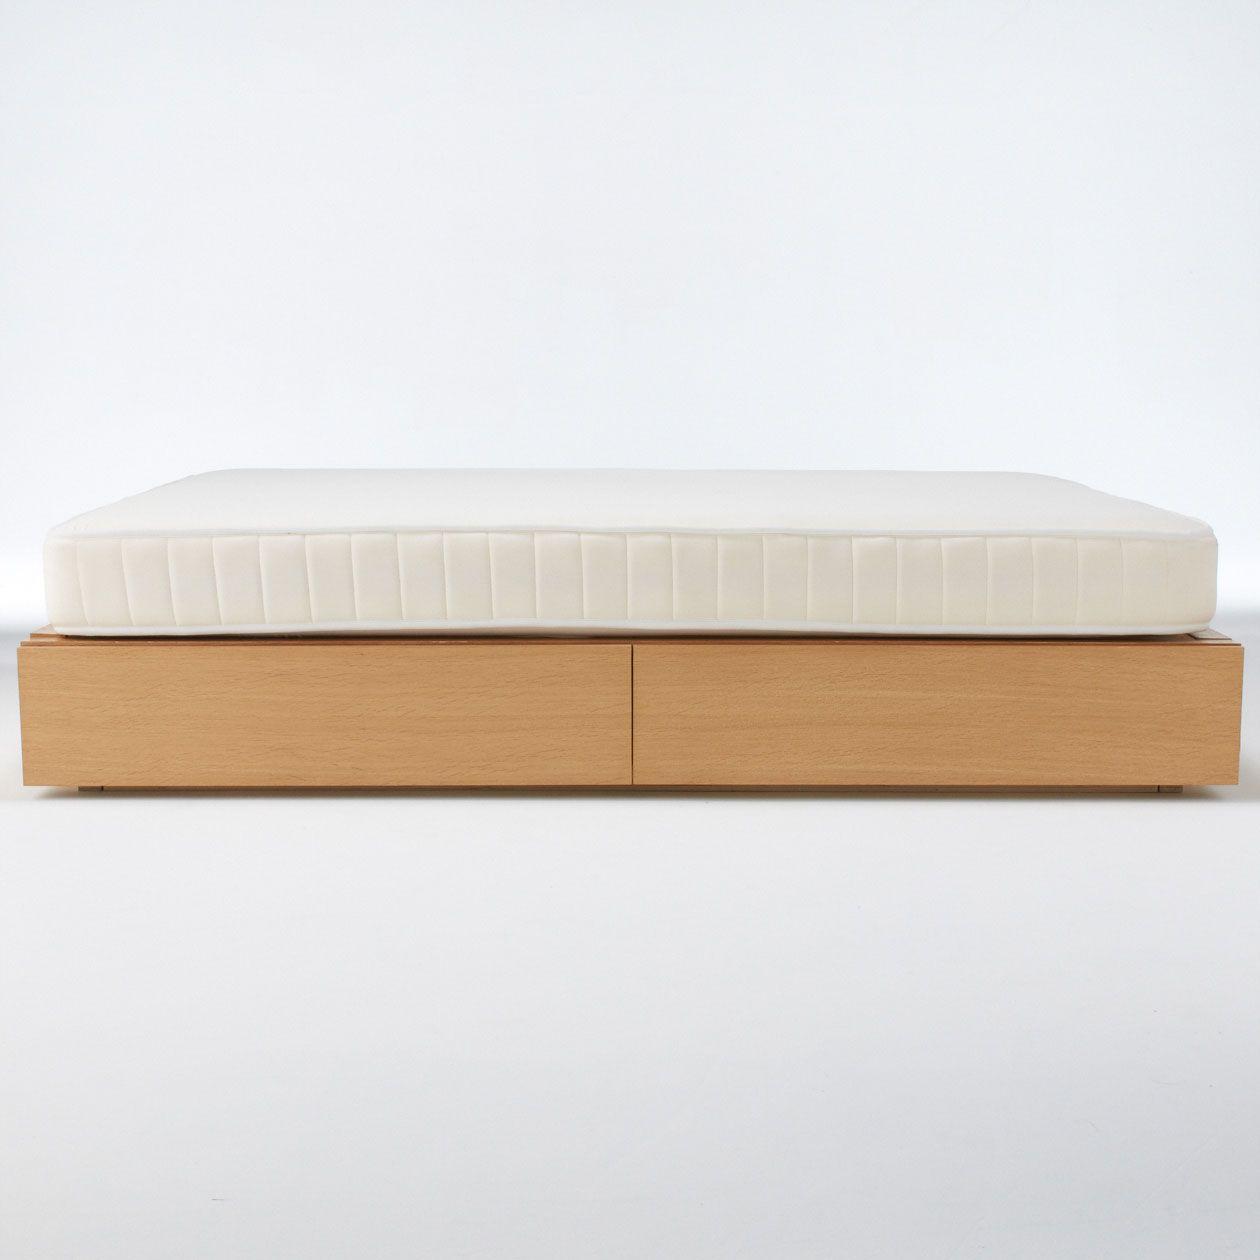 Fuji 350 Oak Storage Bed Double Muji Bed Storage Bed